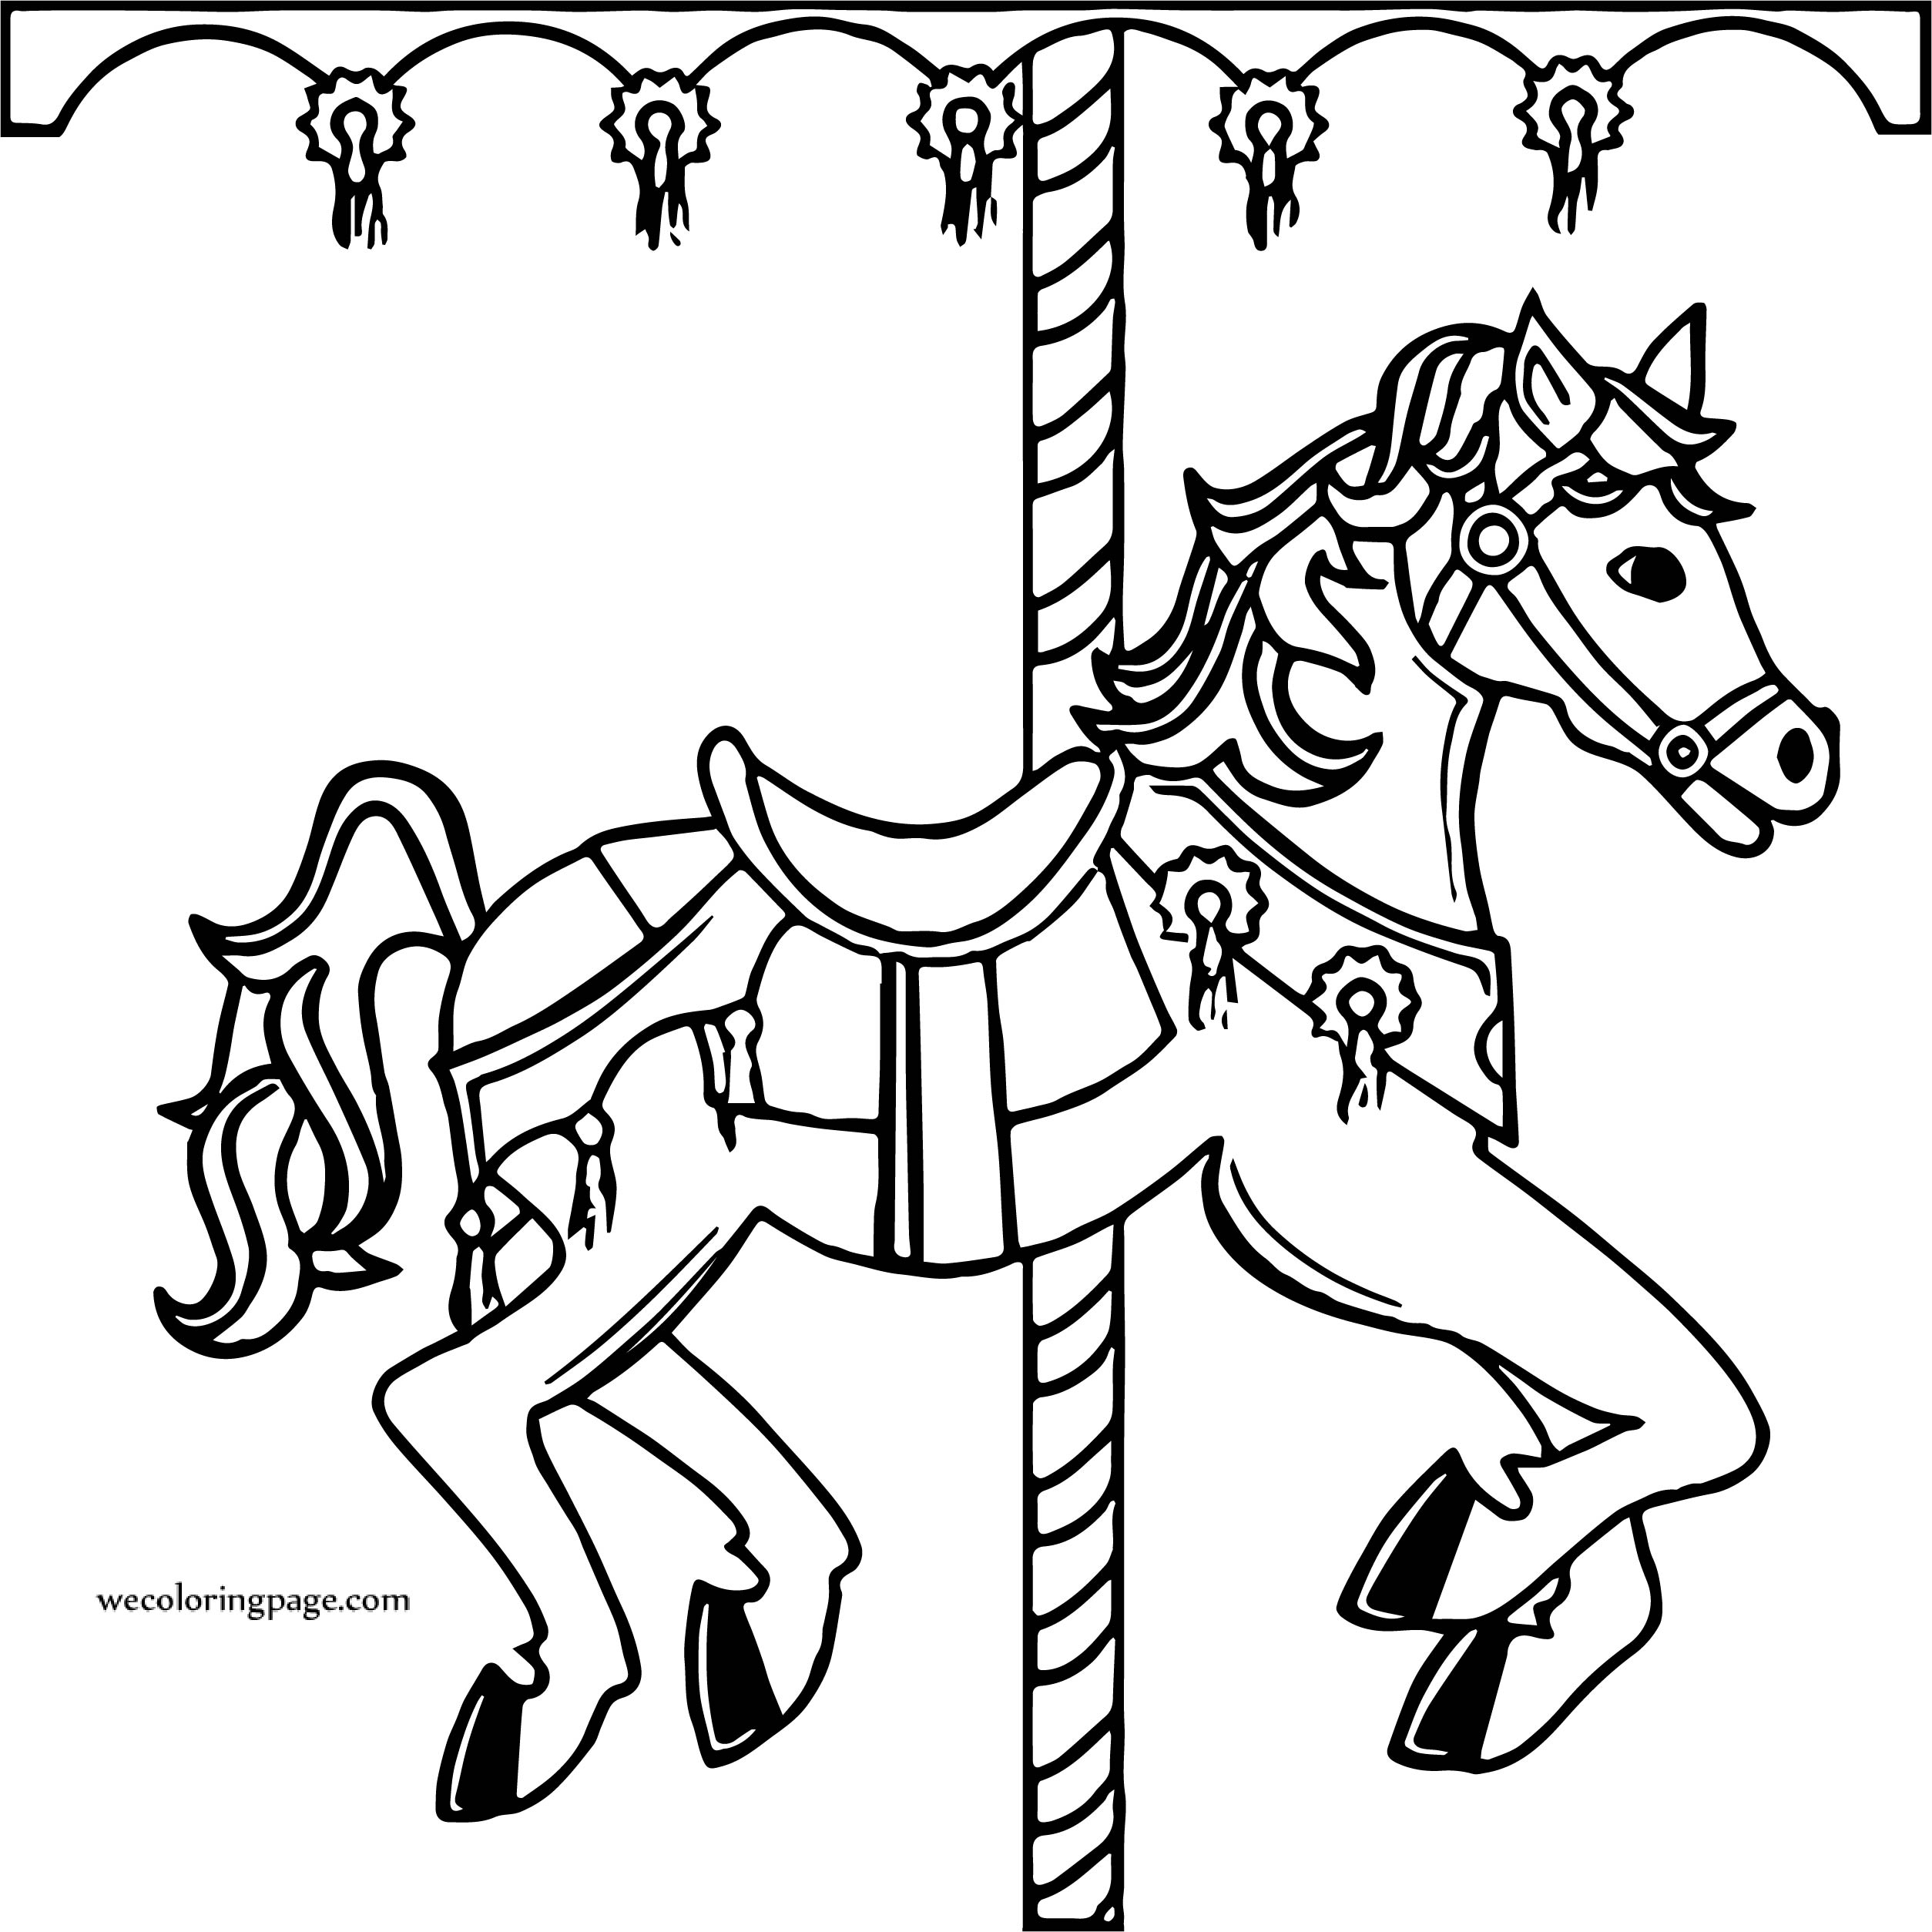 Lunapark Horse Circus Coloring Page | Wecoloringpage.com